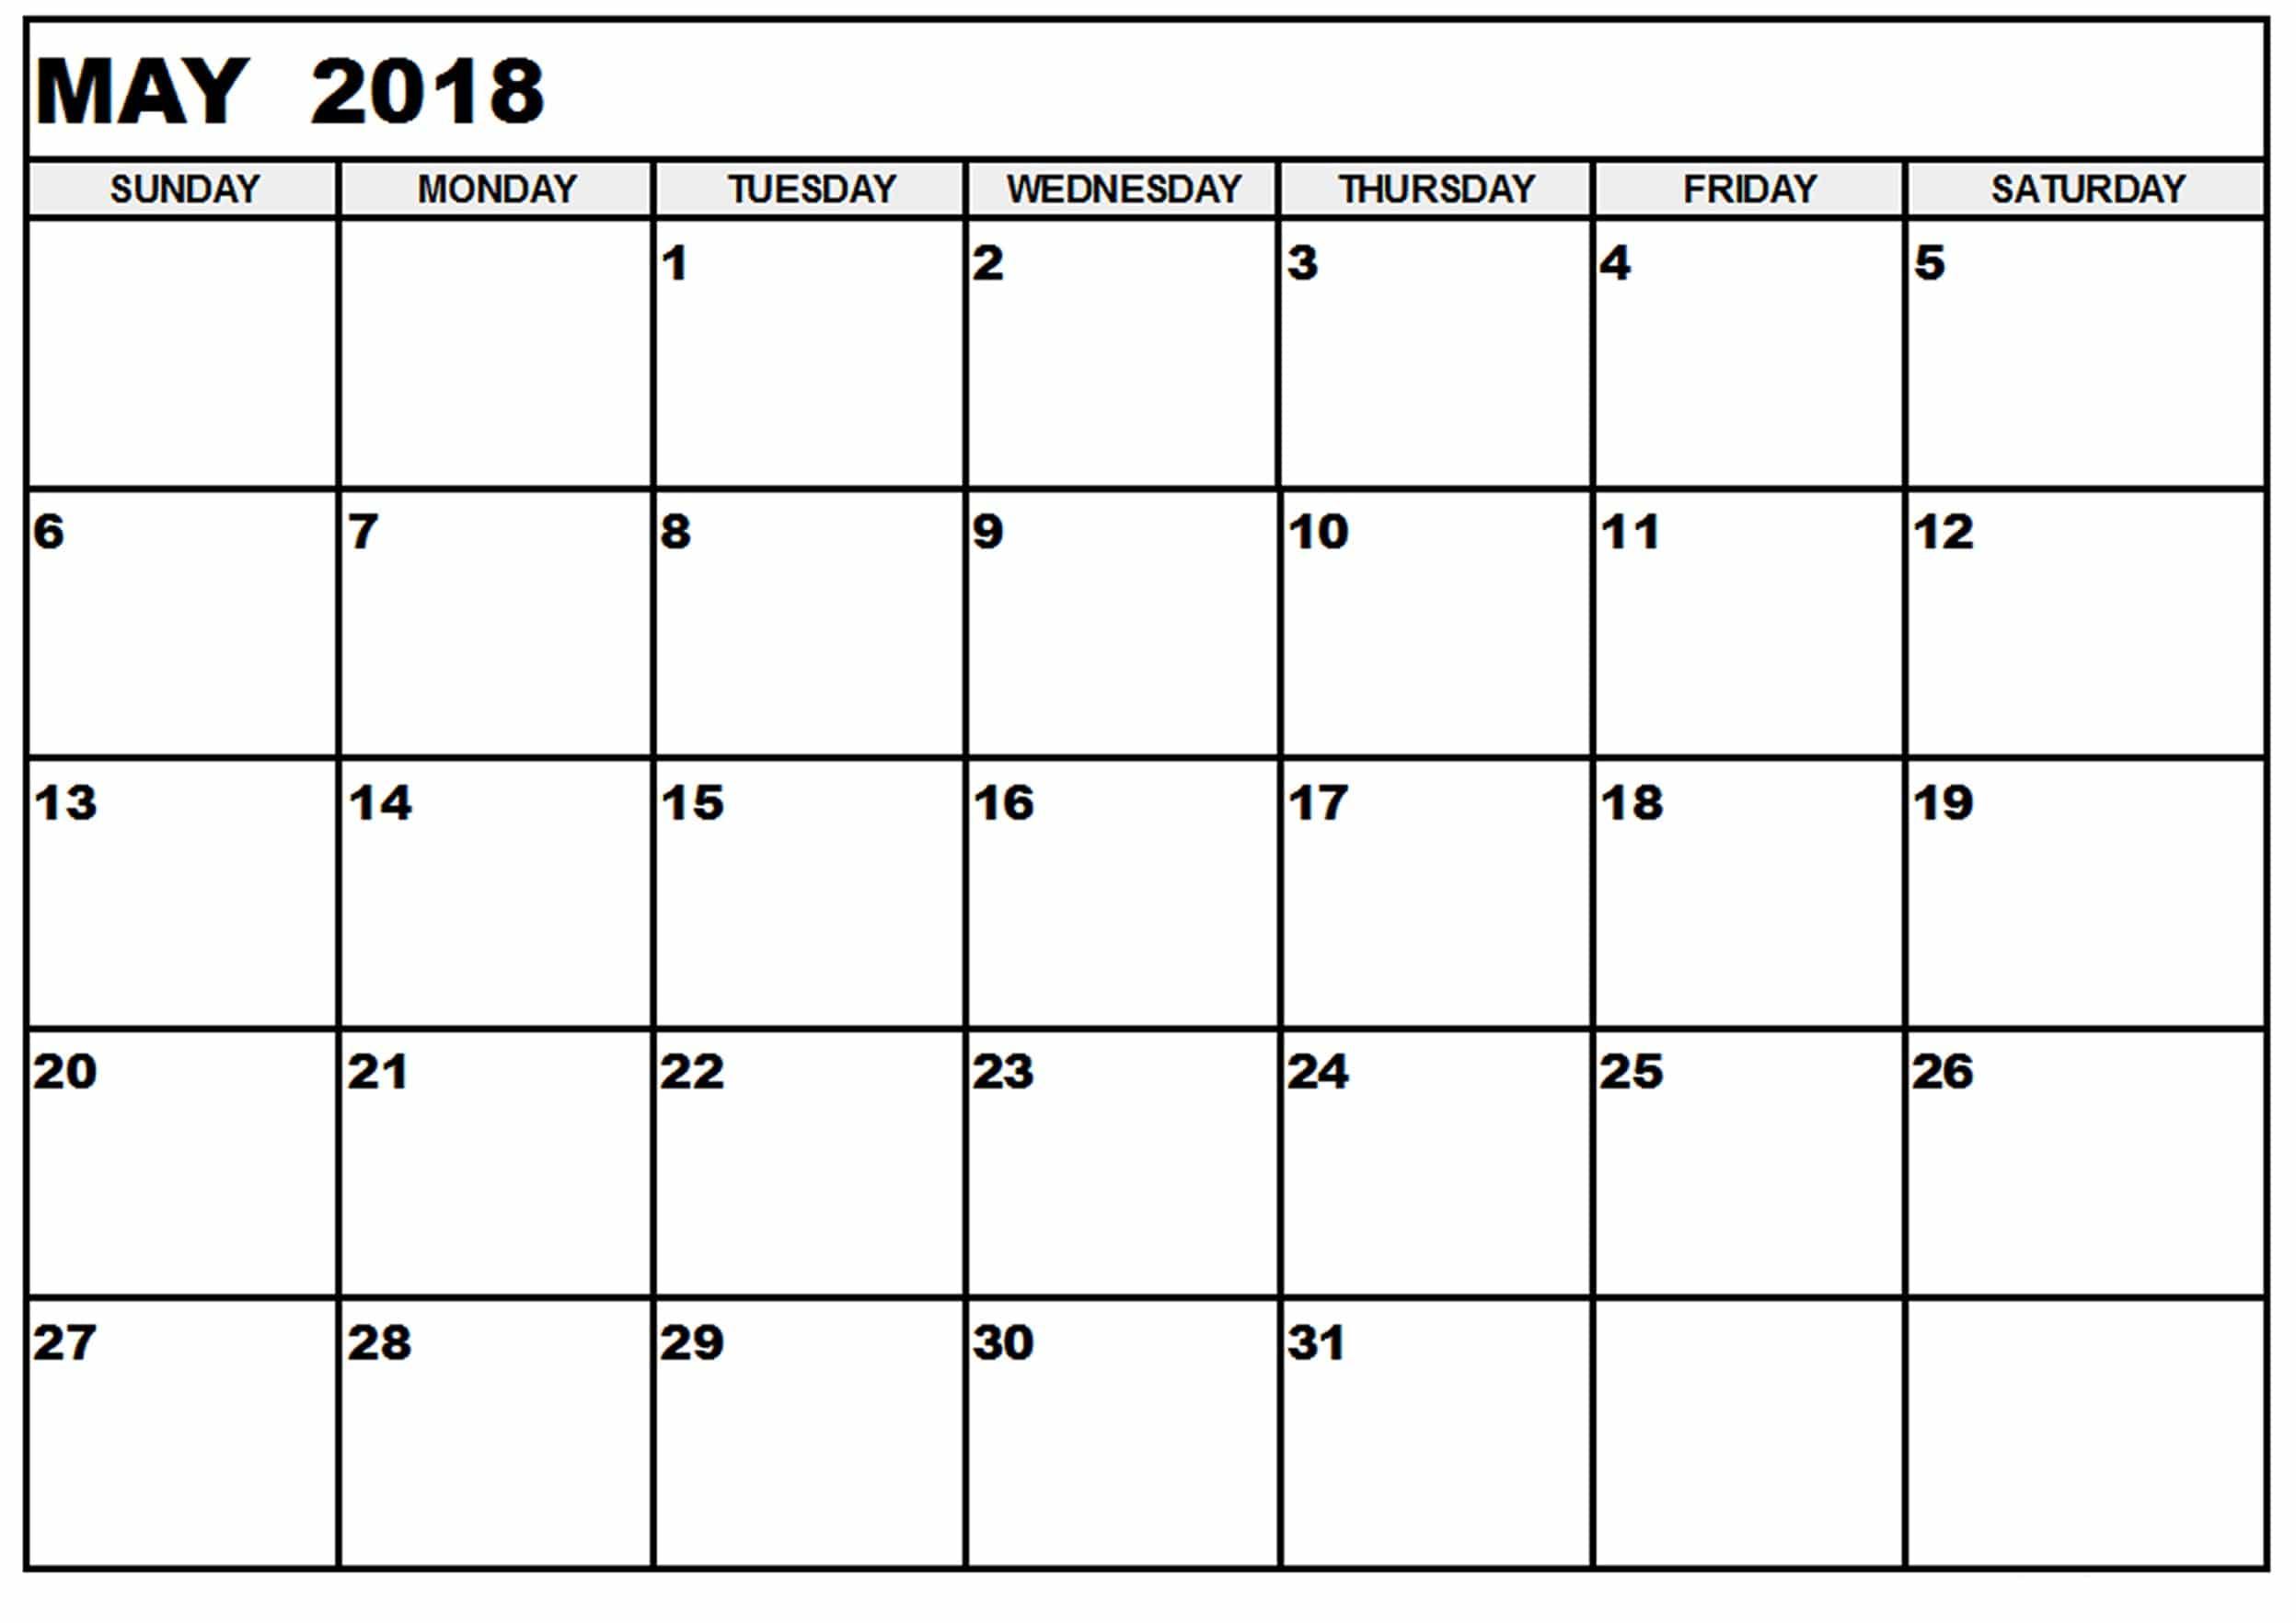 2018 May Calendar Weak Number